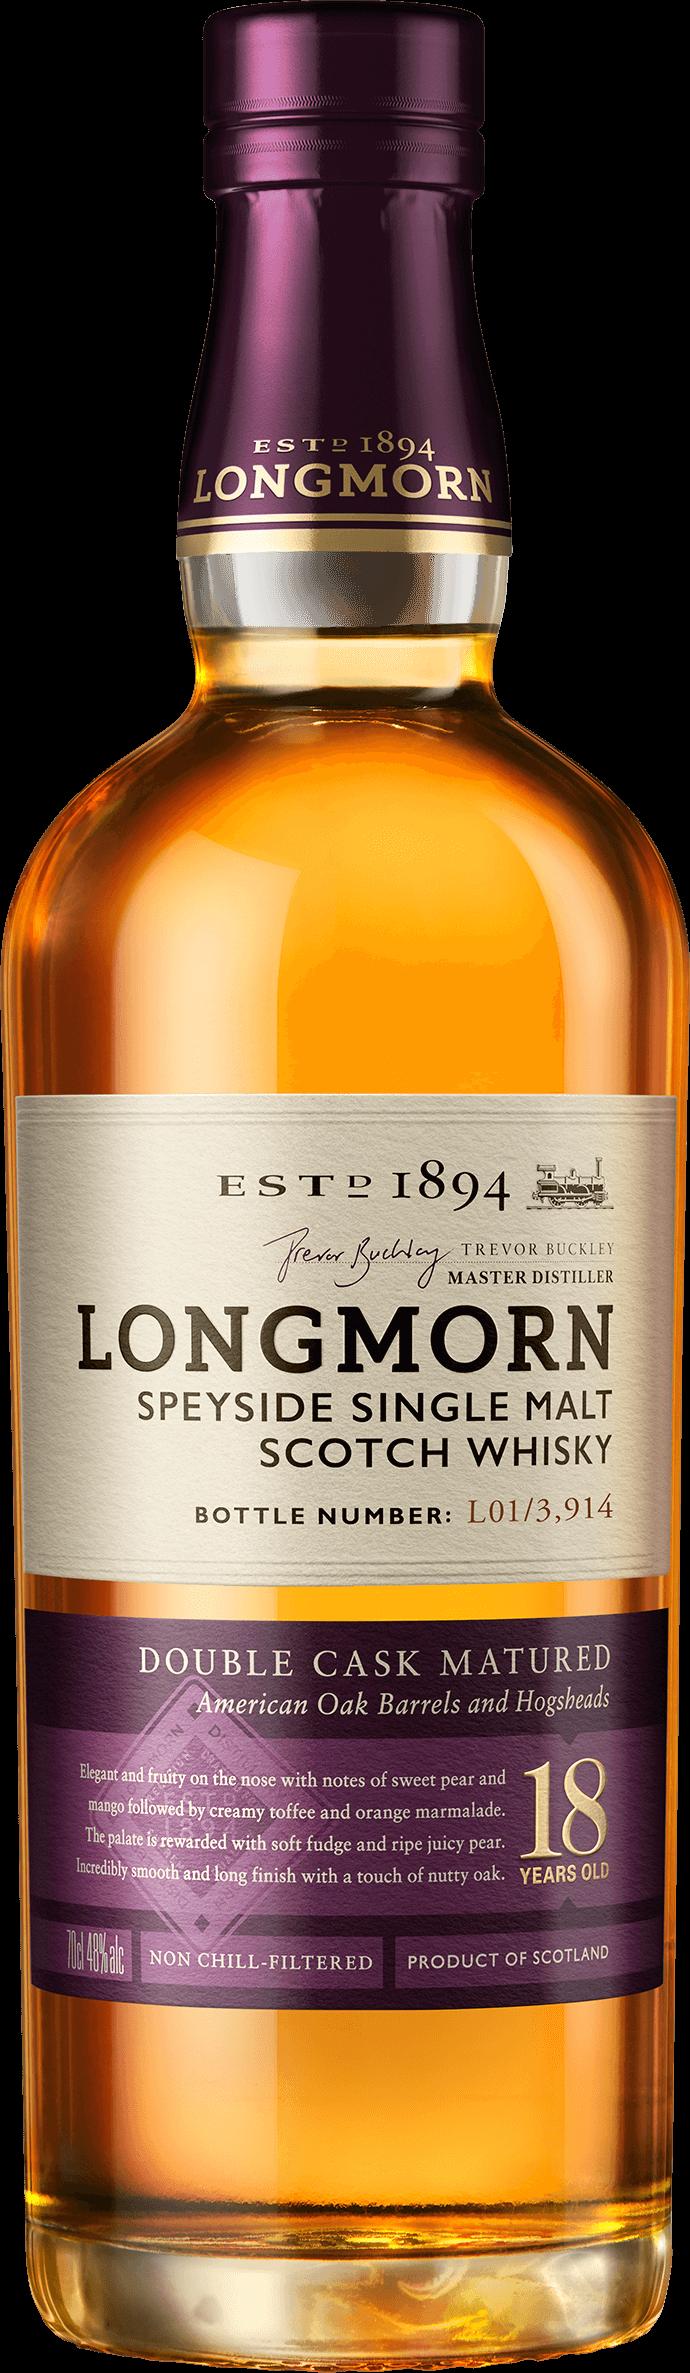 Longmorn aged 18 years